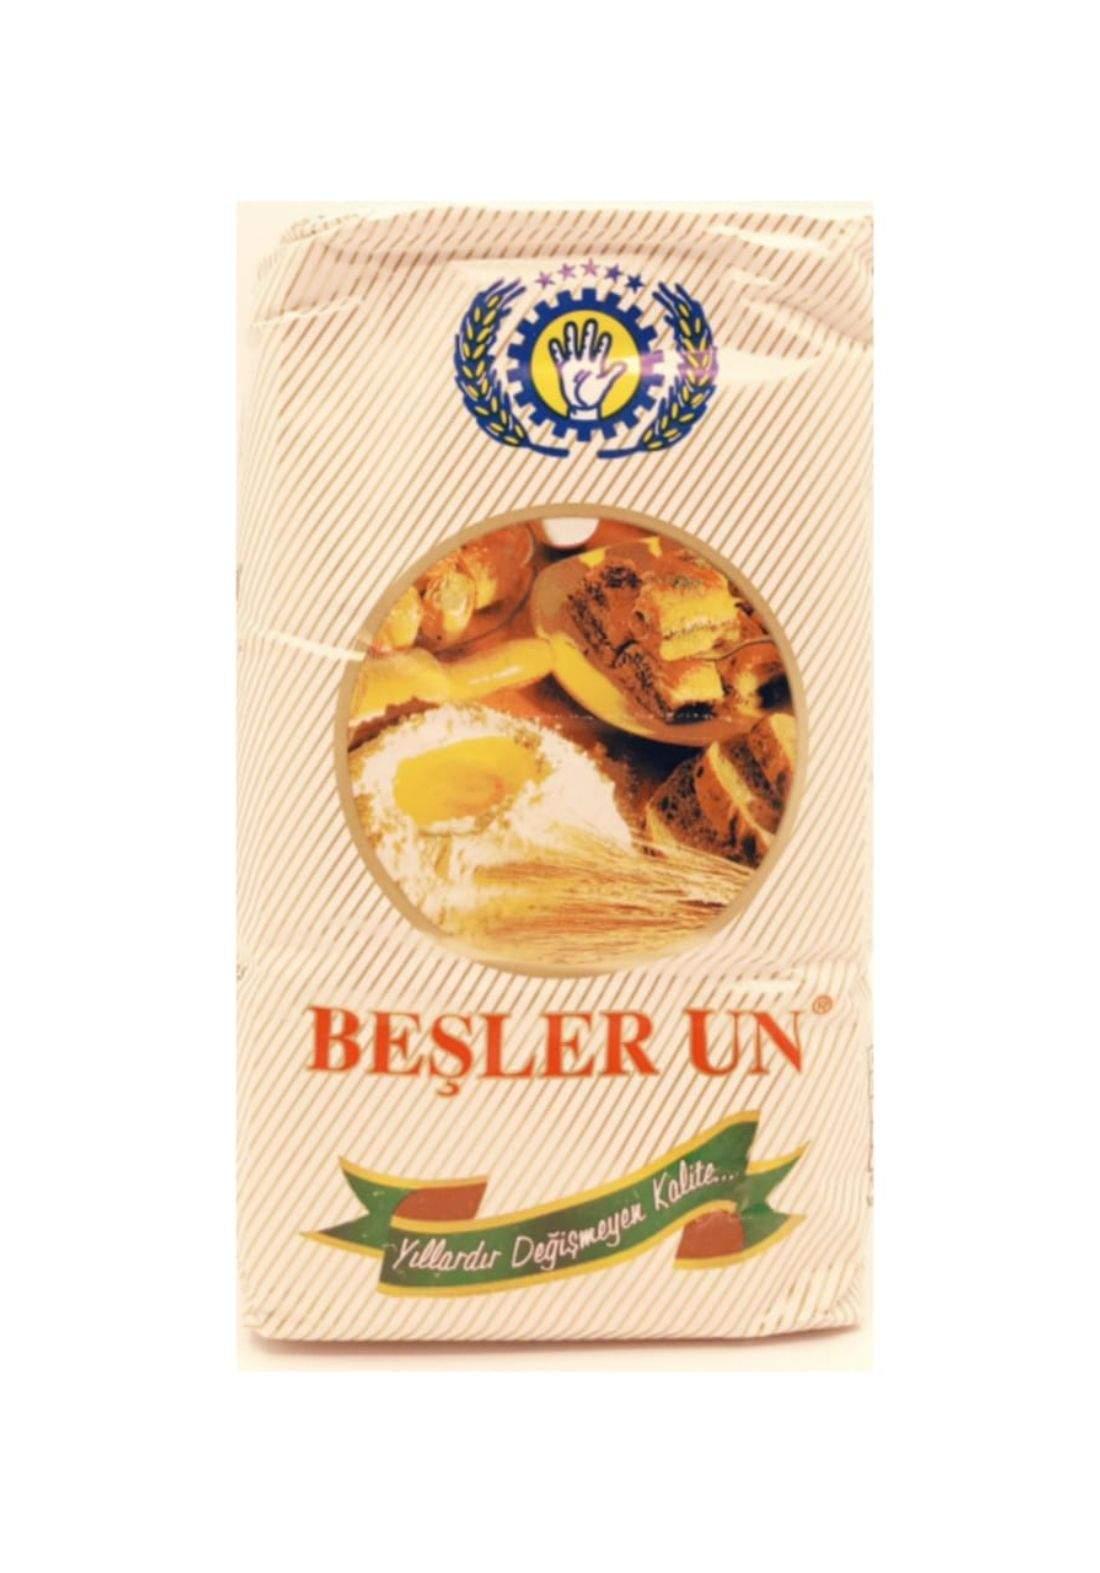 Besler Flour طحين بشلر